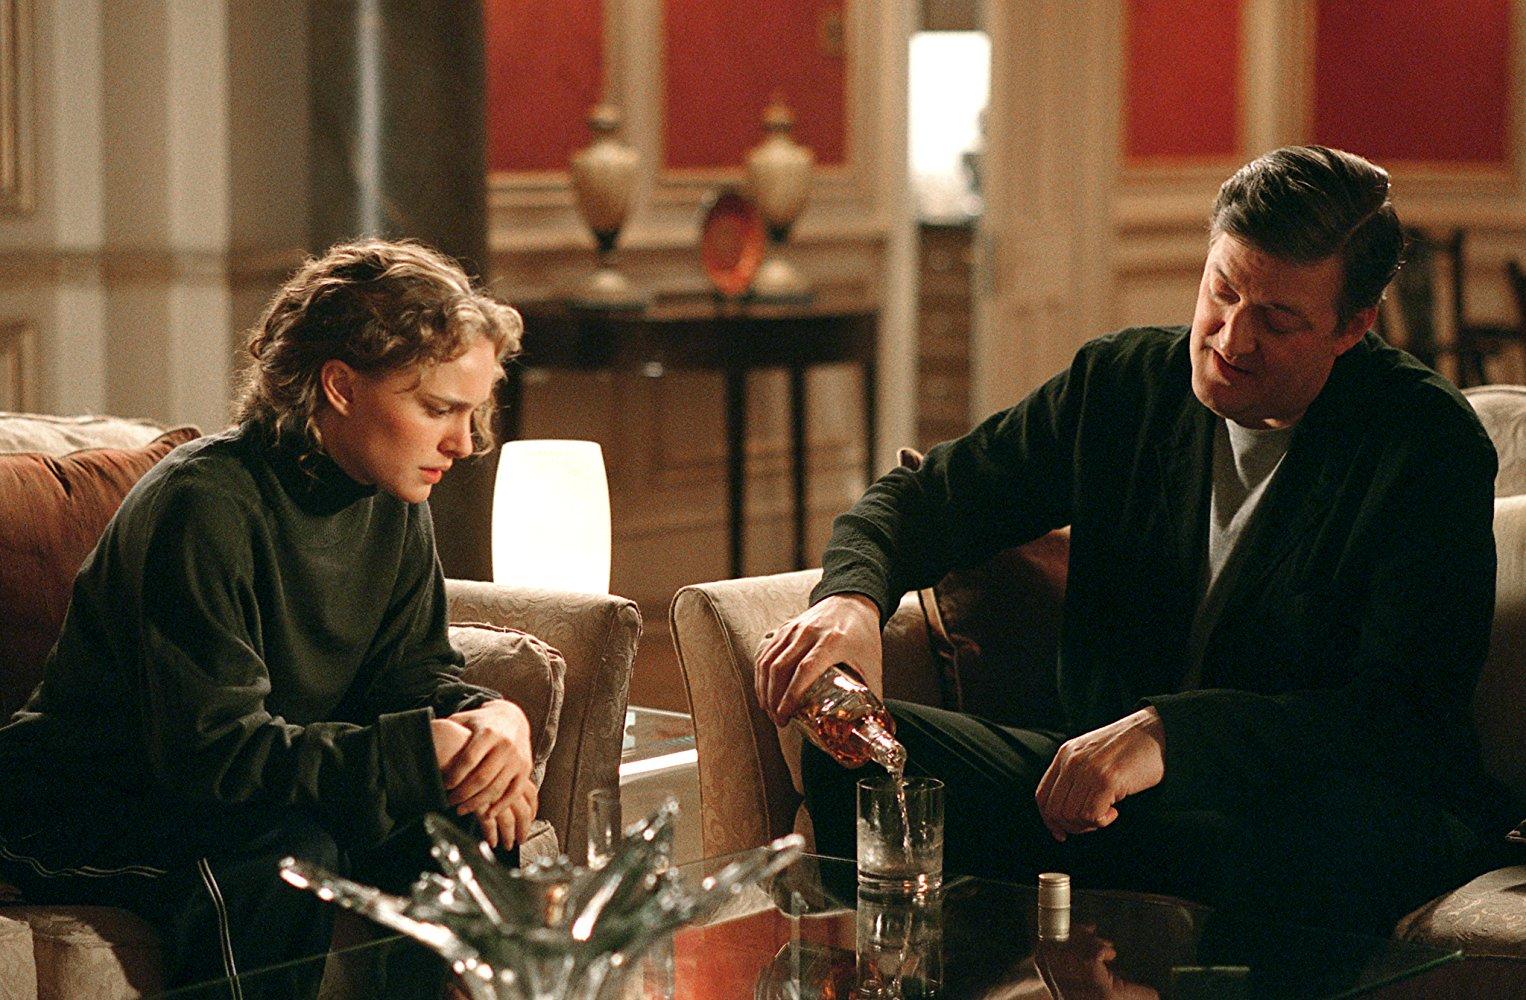 Stephen Fry és Natalie Portman a V mint Vérbosszú c. filmben